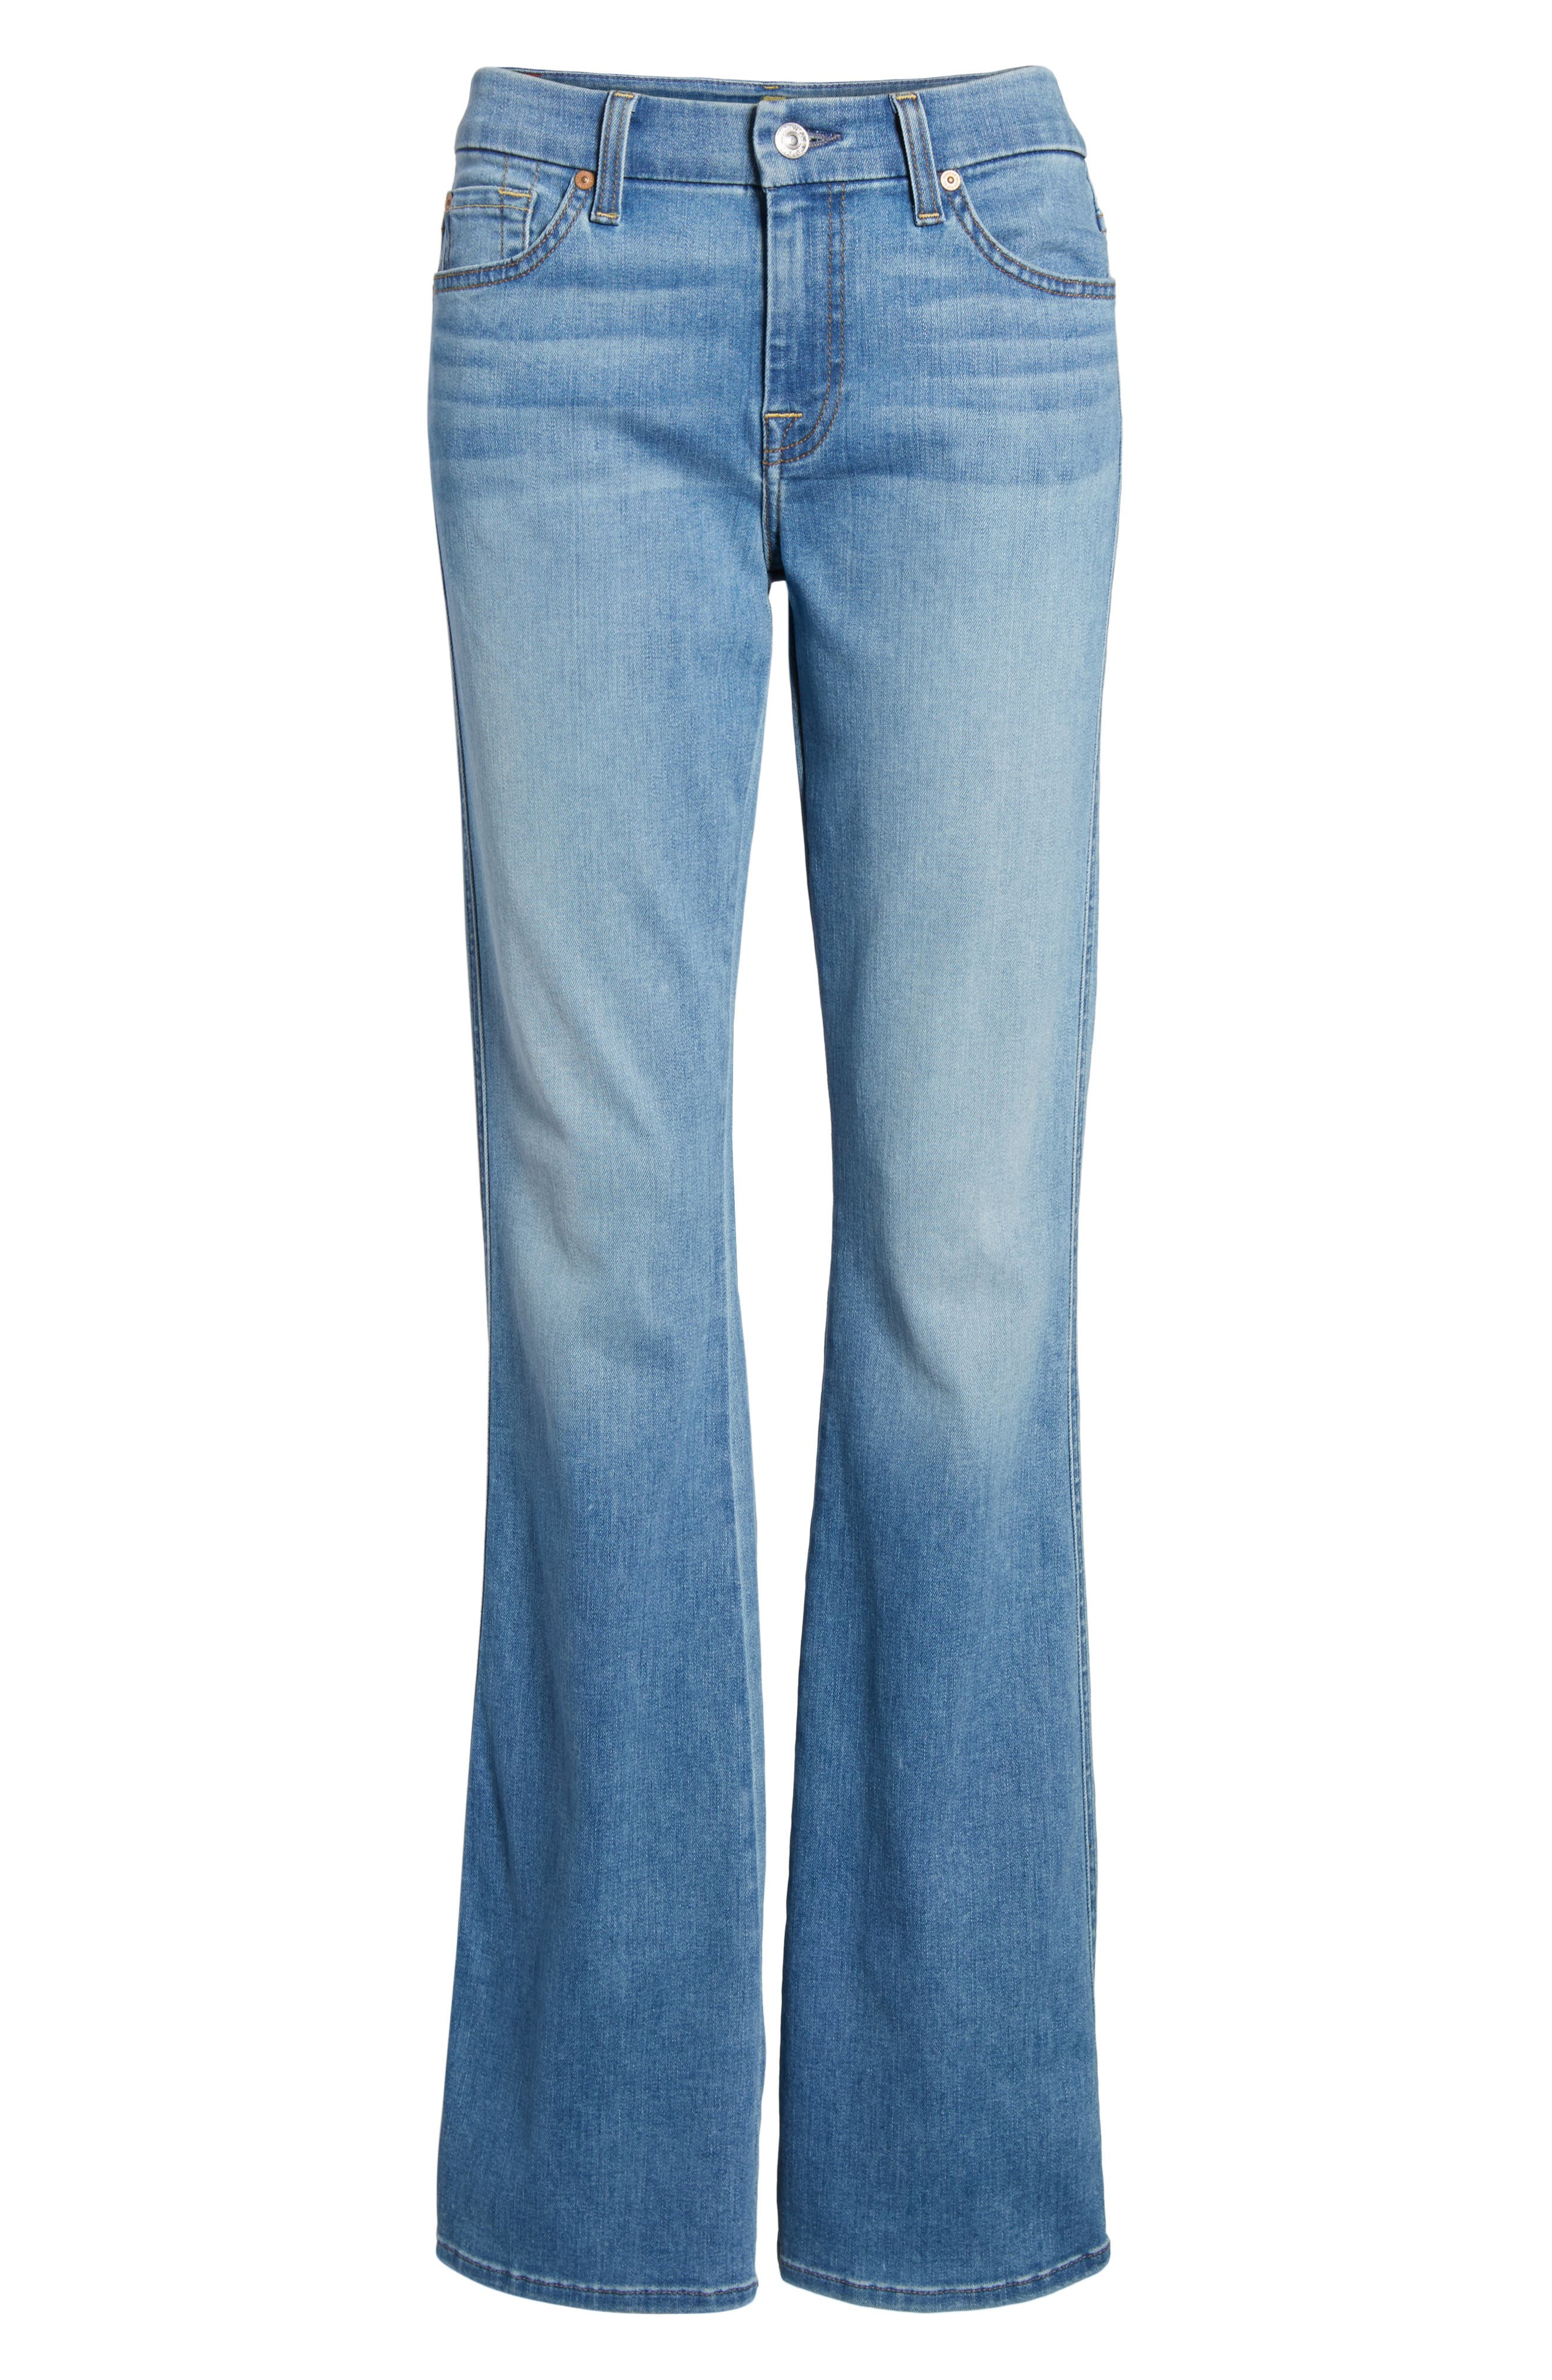 A-Pocket Flare Leg Jeans,                             Alternate thumbnail 7, color,                             401